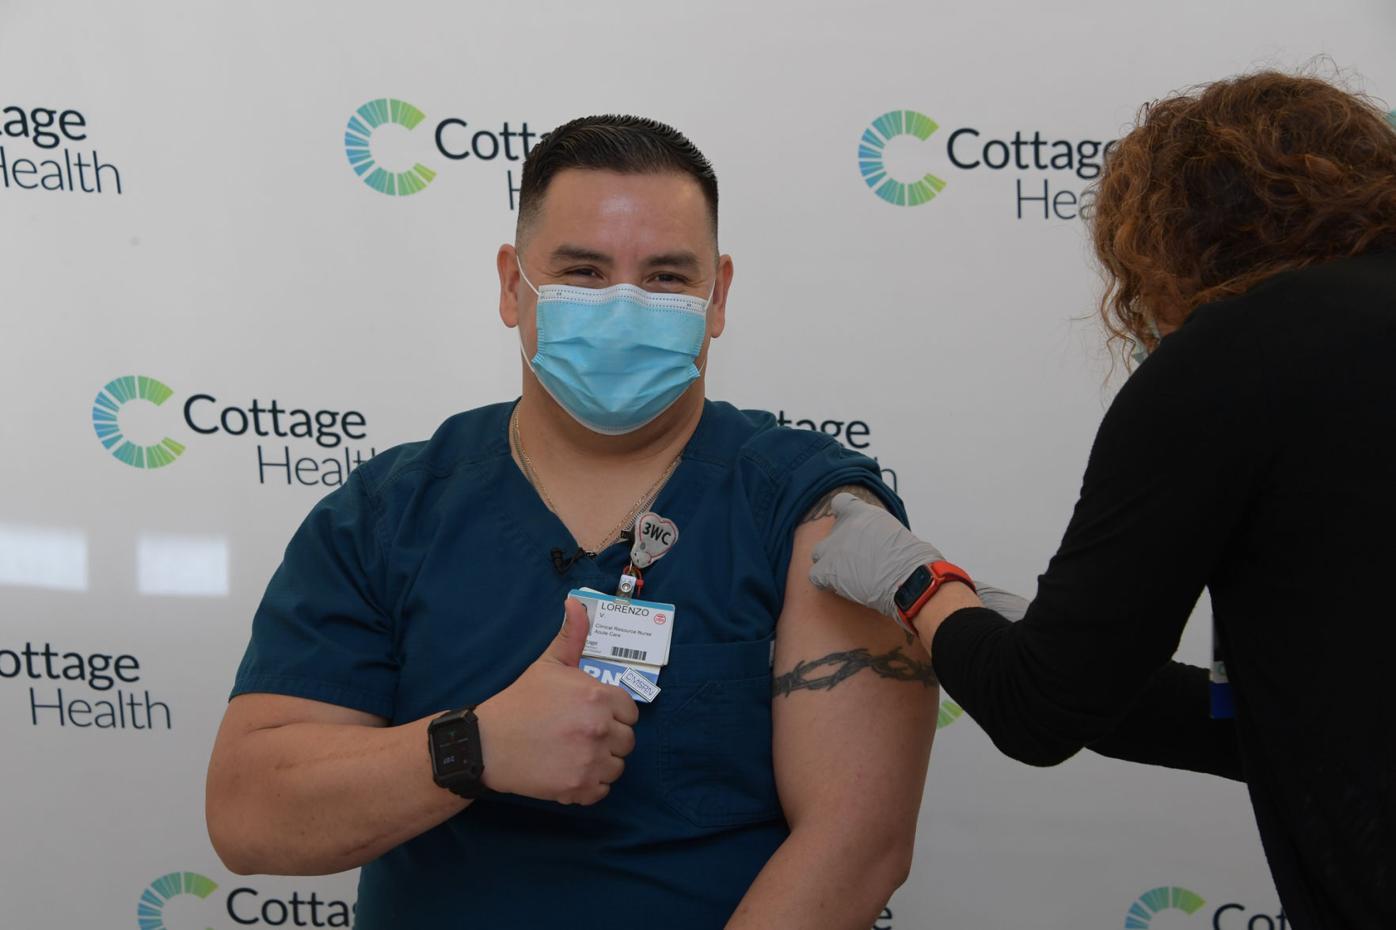 Cottage vaccine 3.jpg